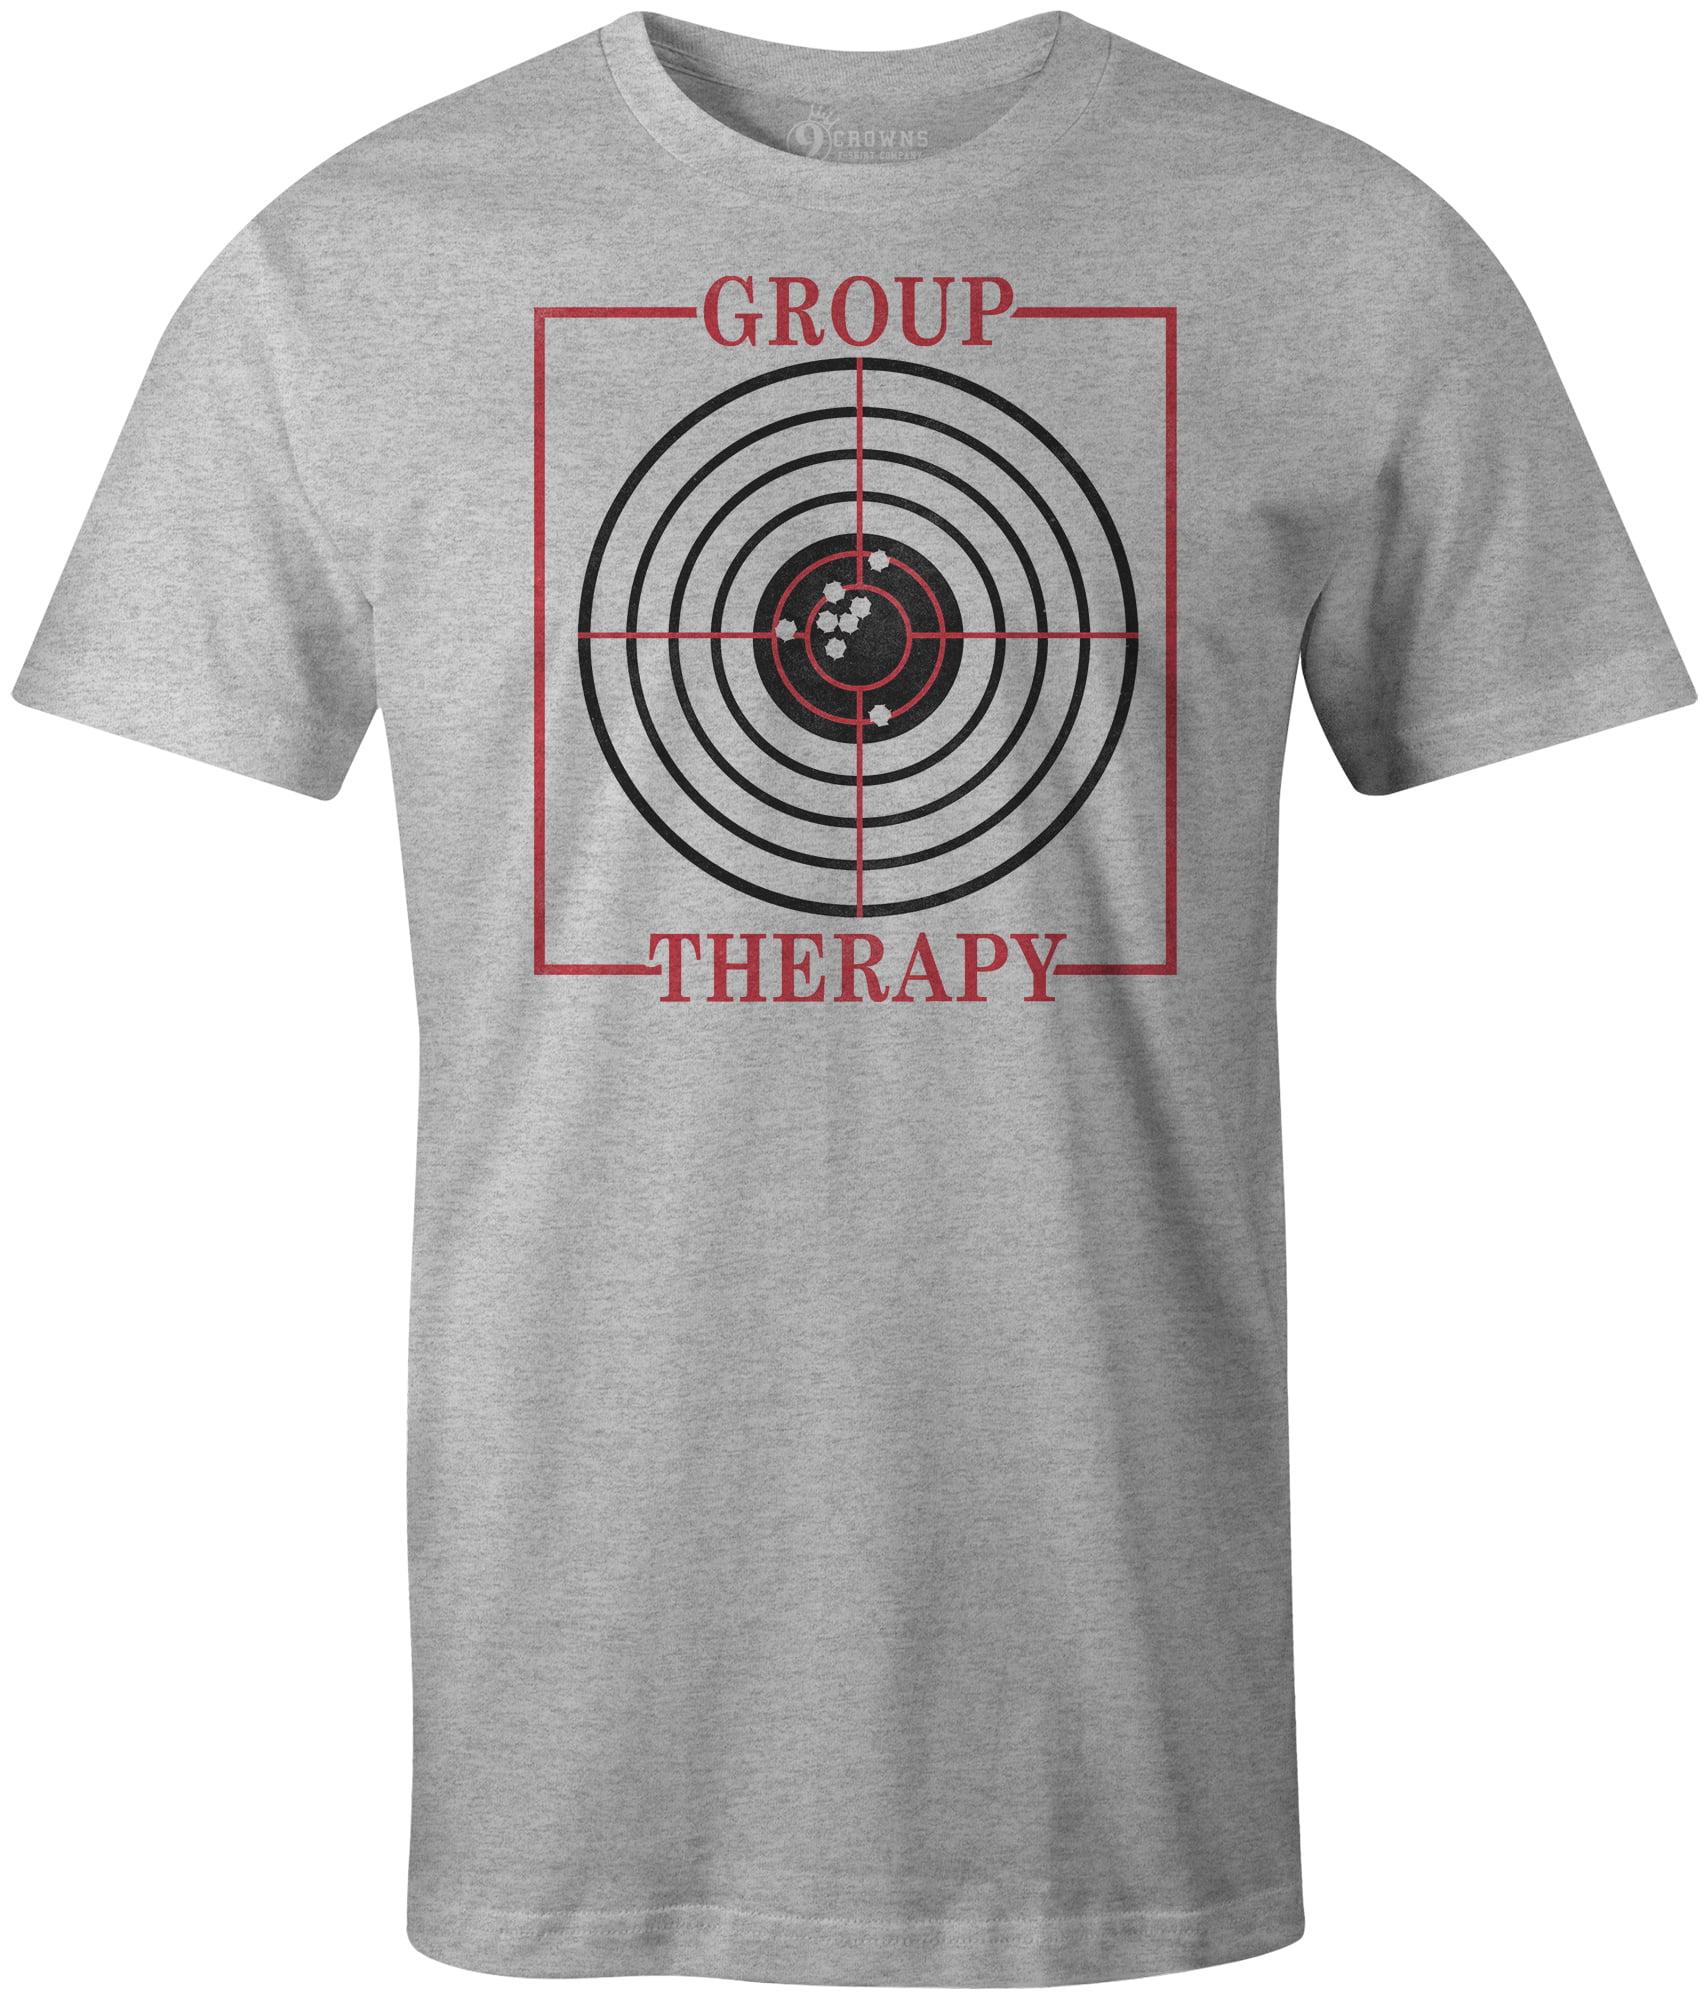 3e52b3096d 9 Crowns Tees Funny Group Therapy Gun Target Shooting T-Shirt-Mens (Mens  Metal, Medium) - Walmart.com